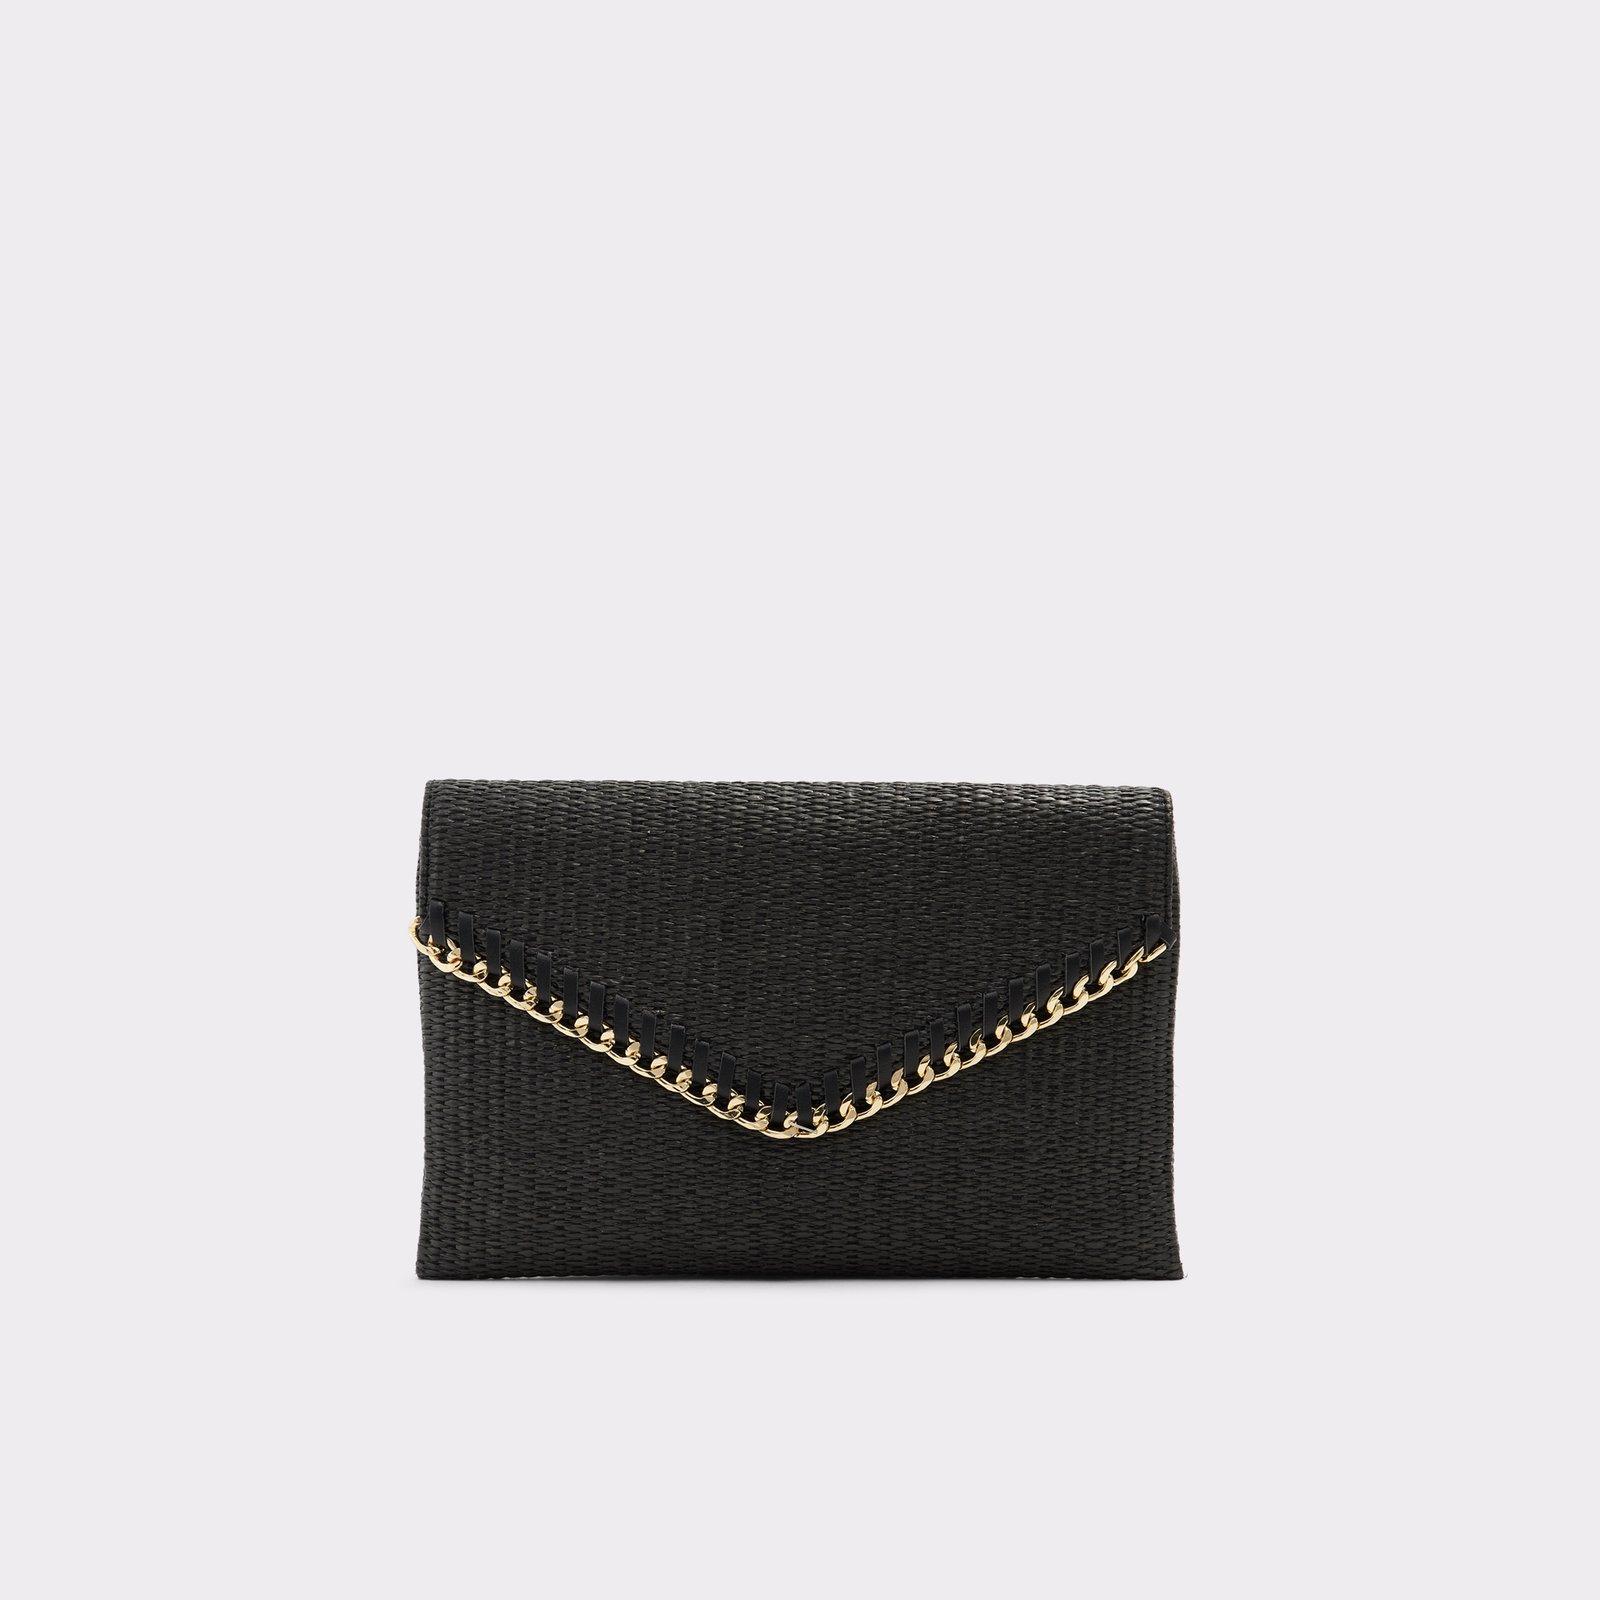 20d4461d5c0 ALDO Runzi - Women s Handbags Clutches   Evening Bags